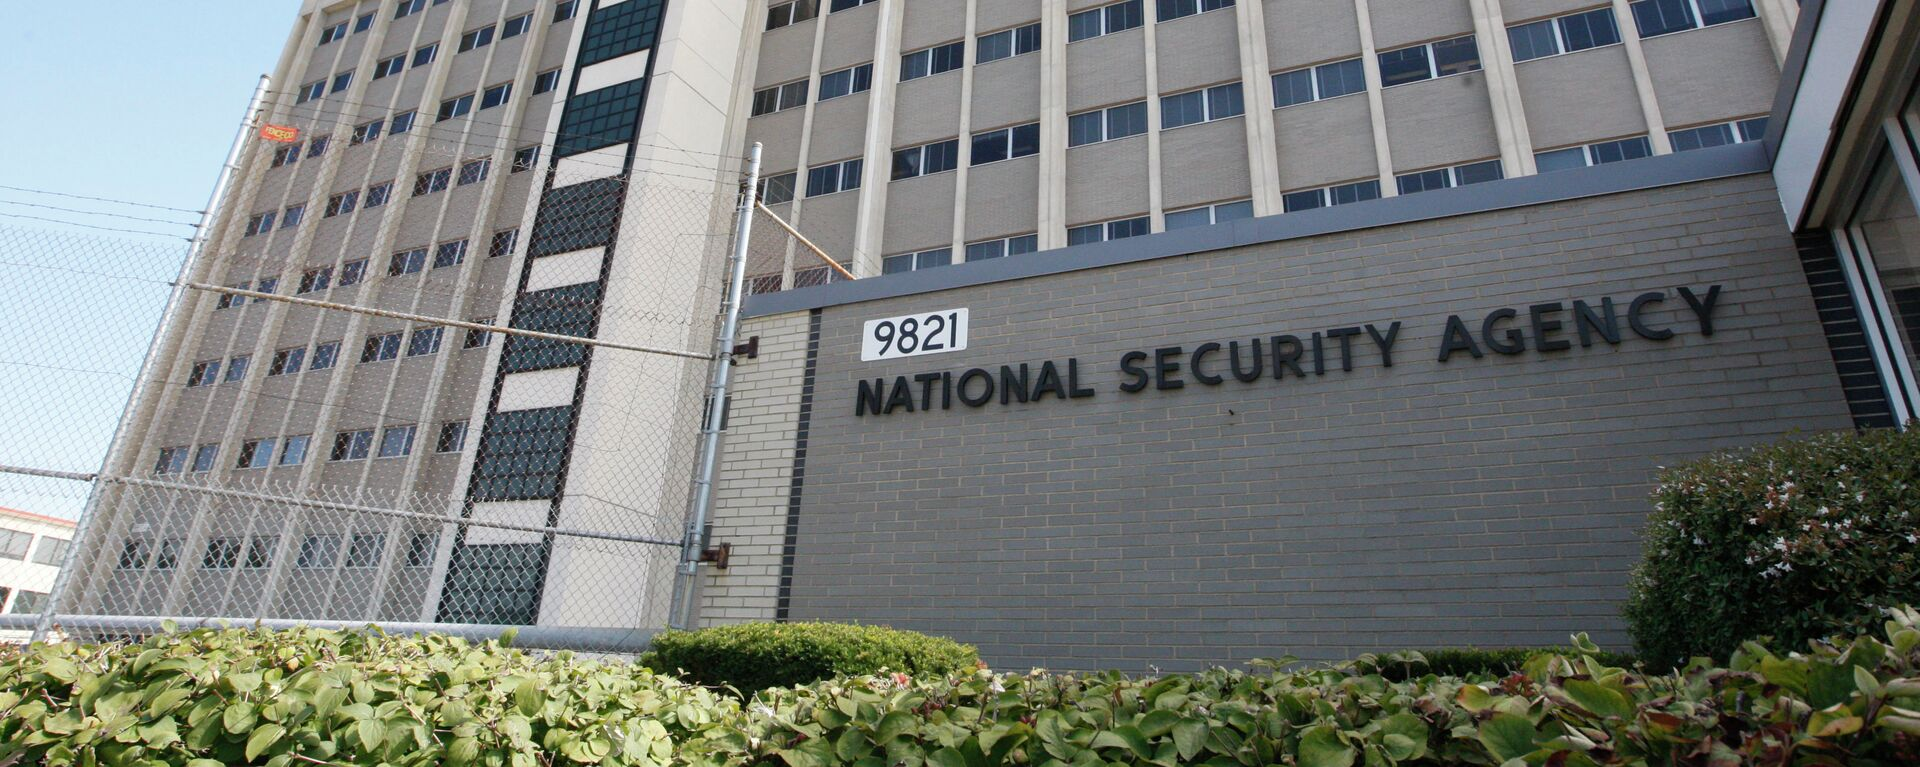 Sede National Security Agency (NSA) - Sputnik Italia, 1920, 31.05.2021